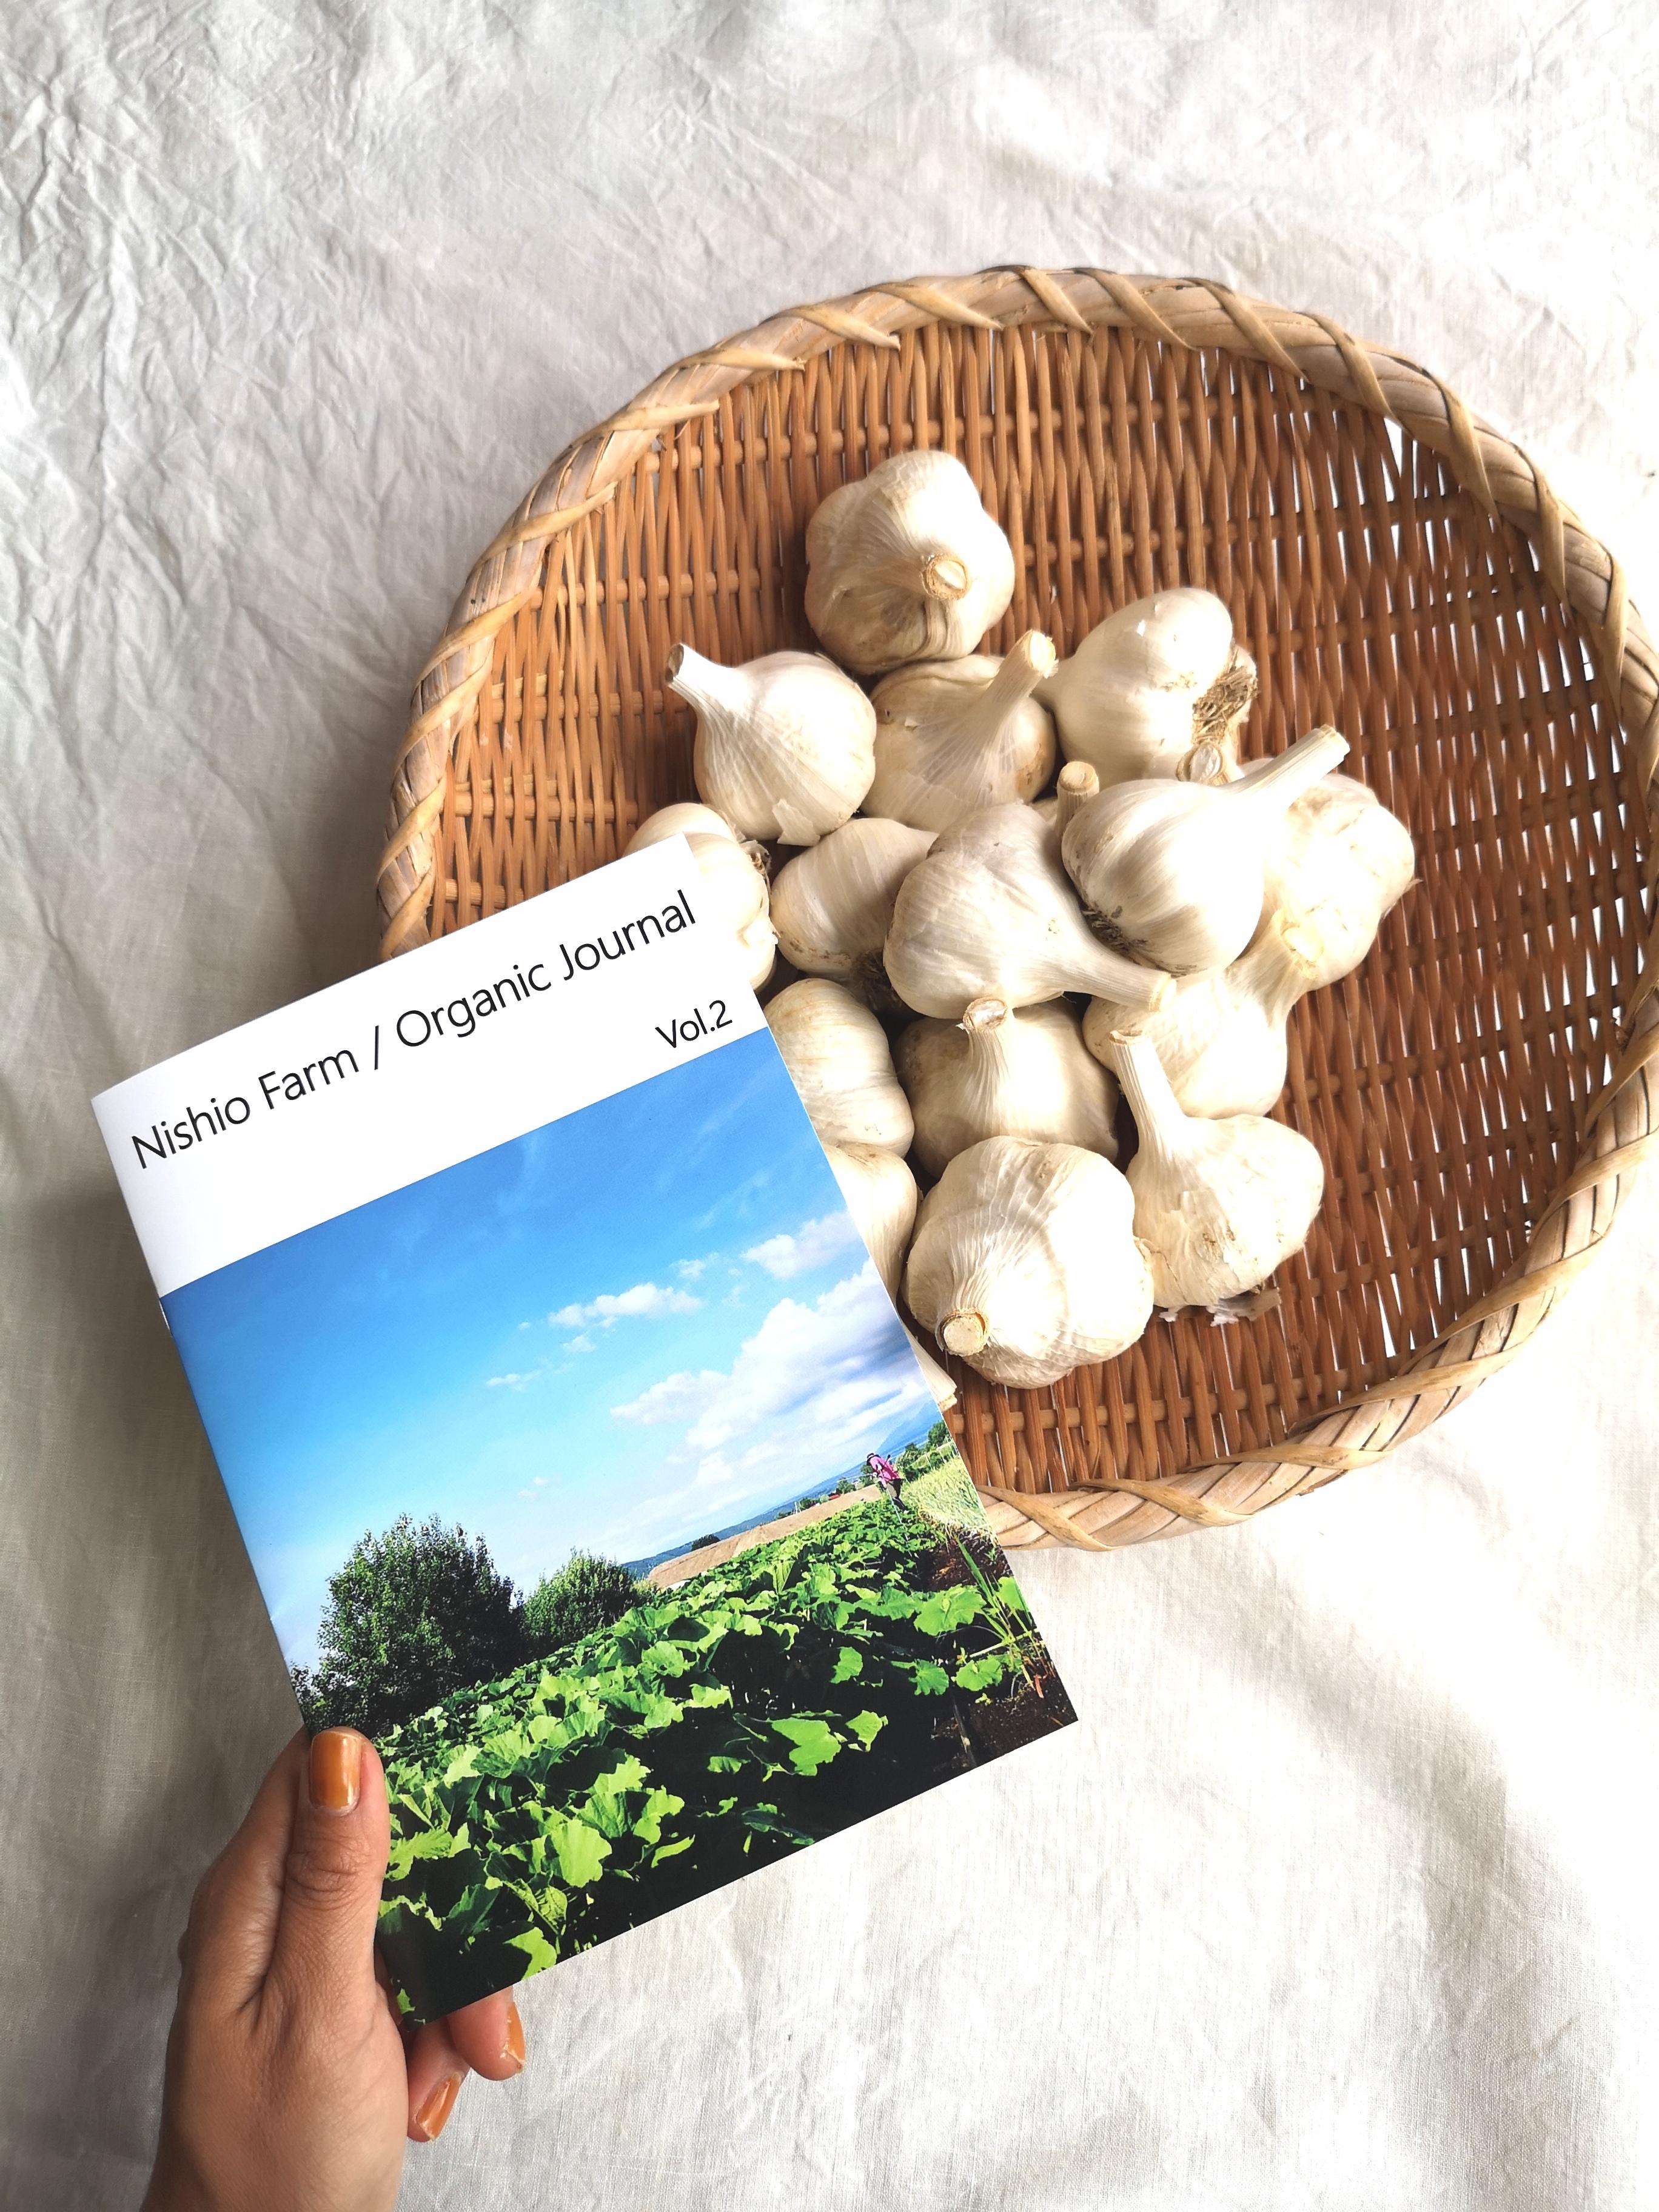 Nishio Farm Journal vol.2 が出来ました。